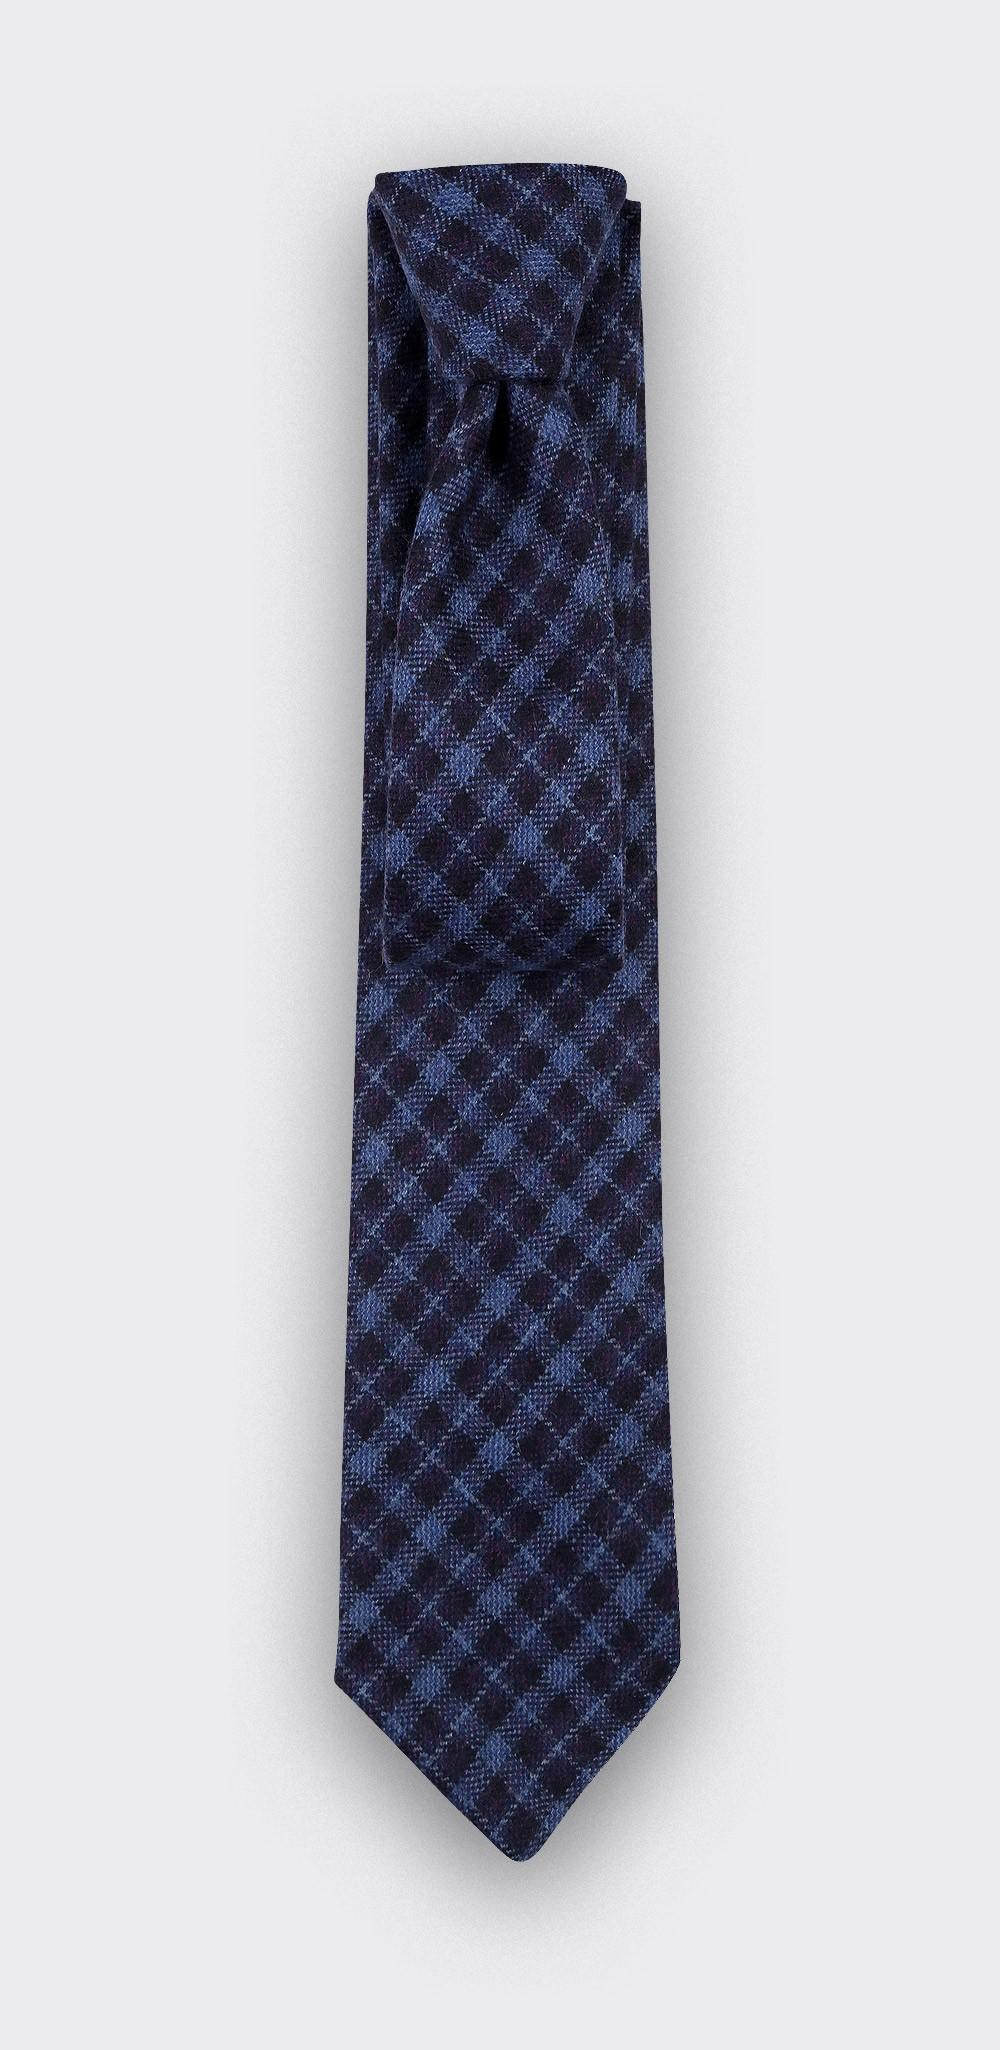 Cravate Alderney Bleue - Cinabre Paris